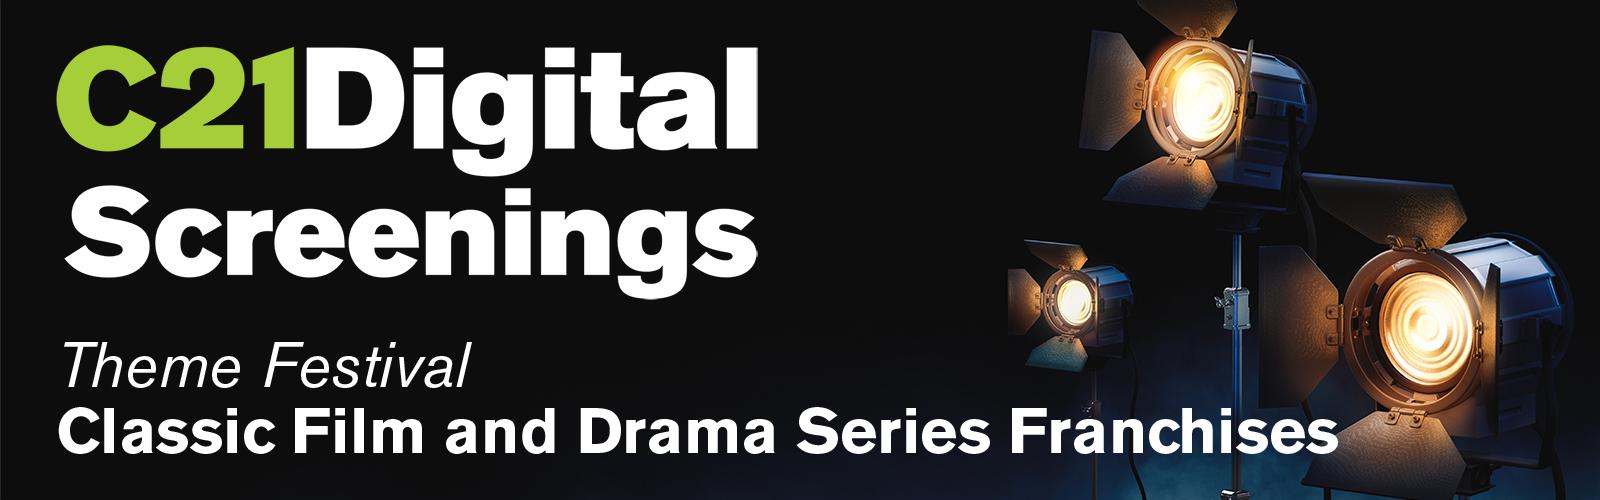 Theme Festival - Classic Film and Drama Series Franchises